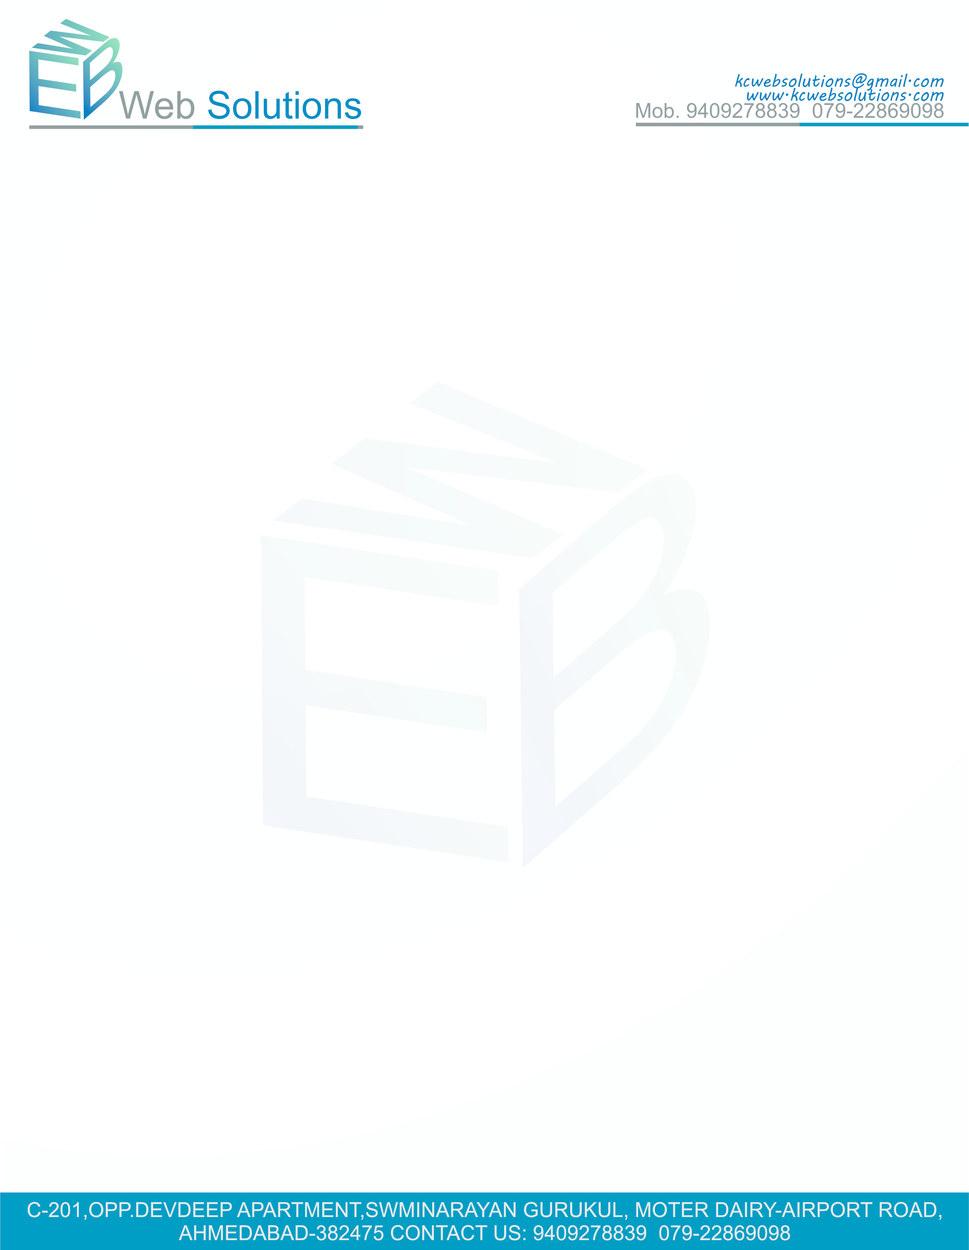 stationary_letter_kunalchauhan_k (5